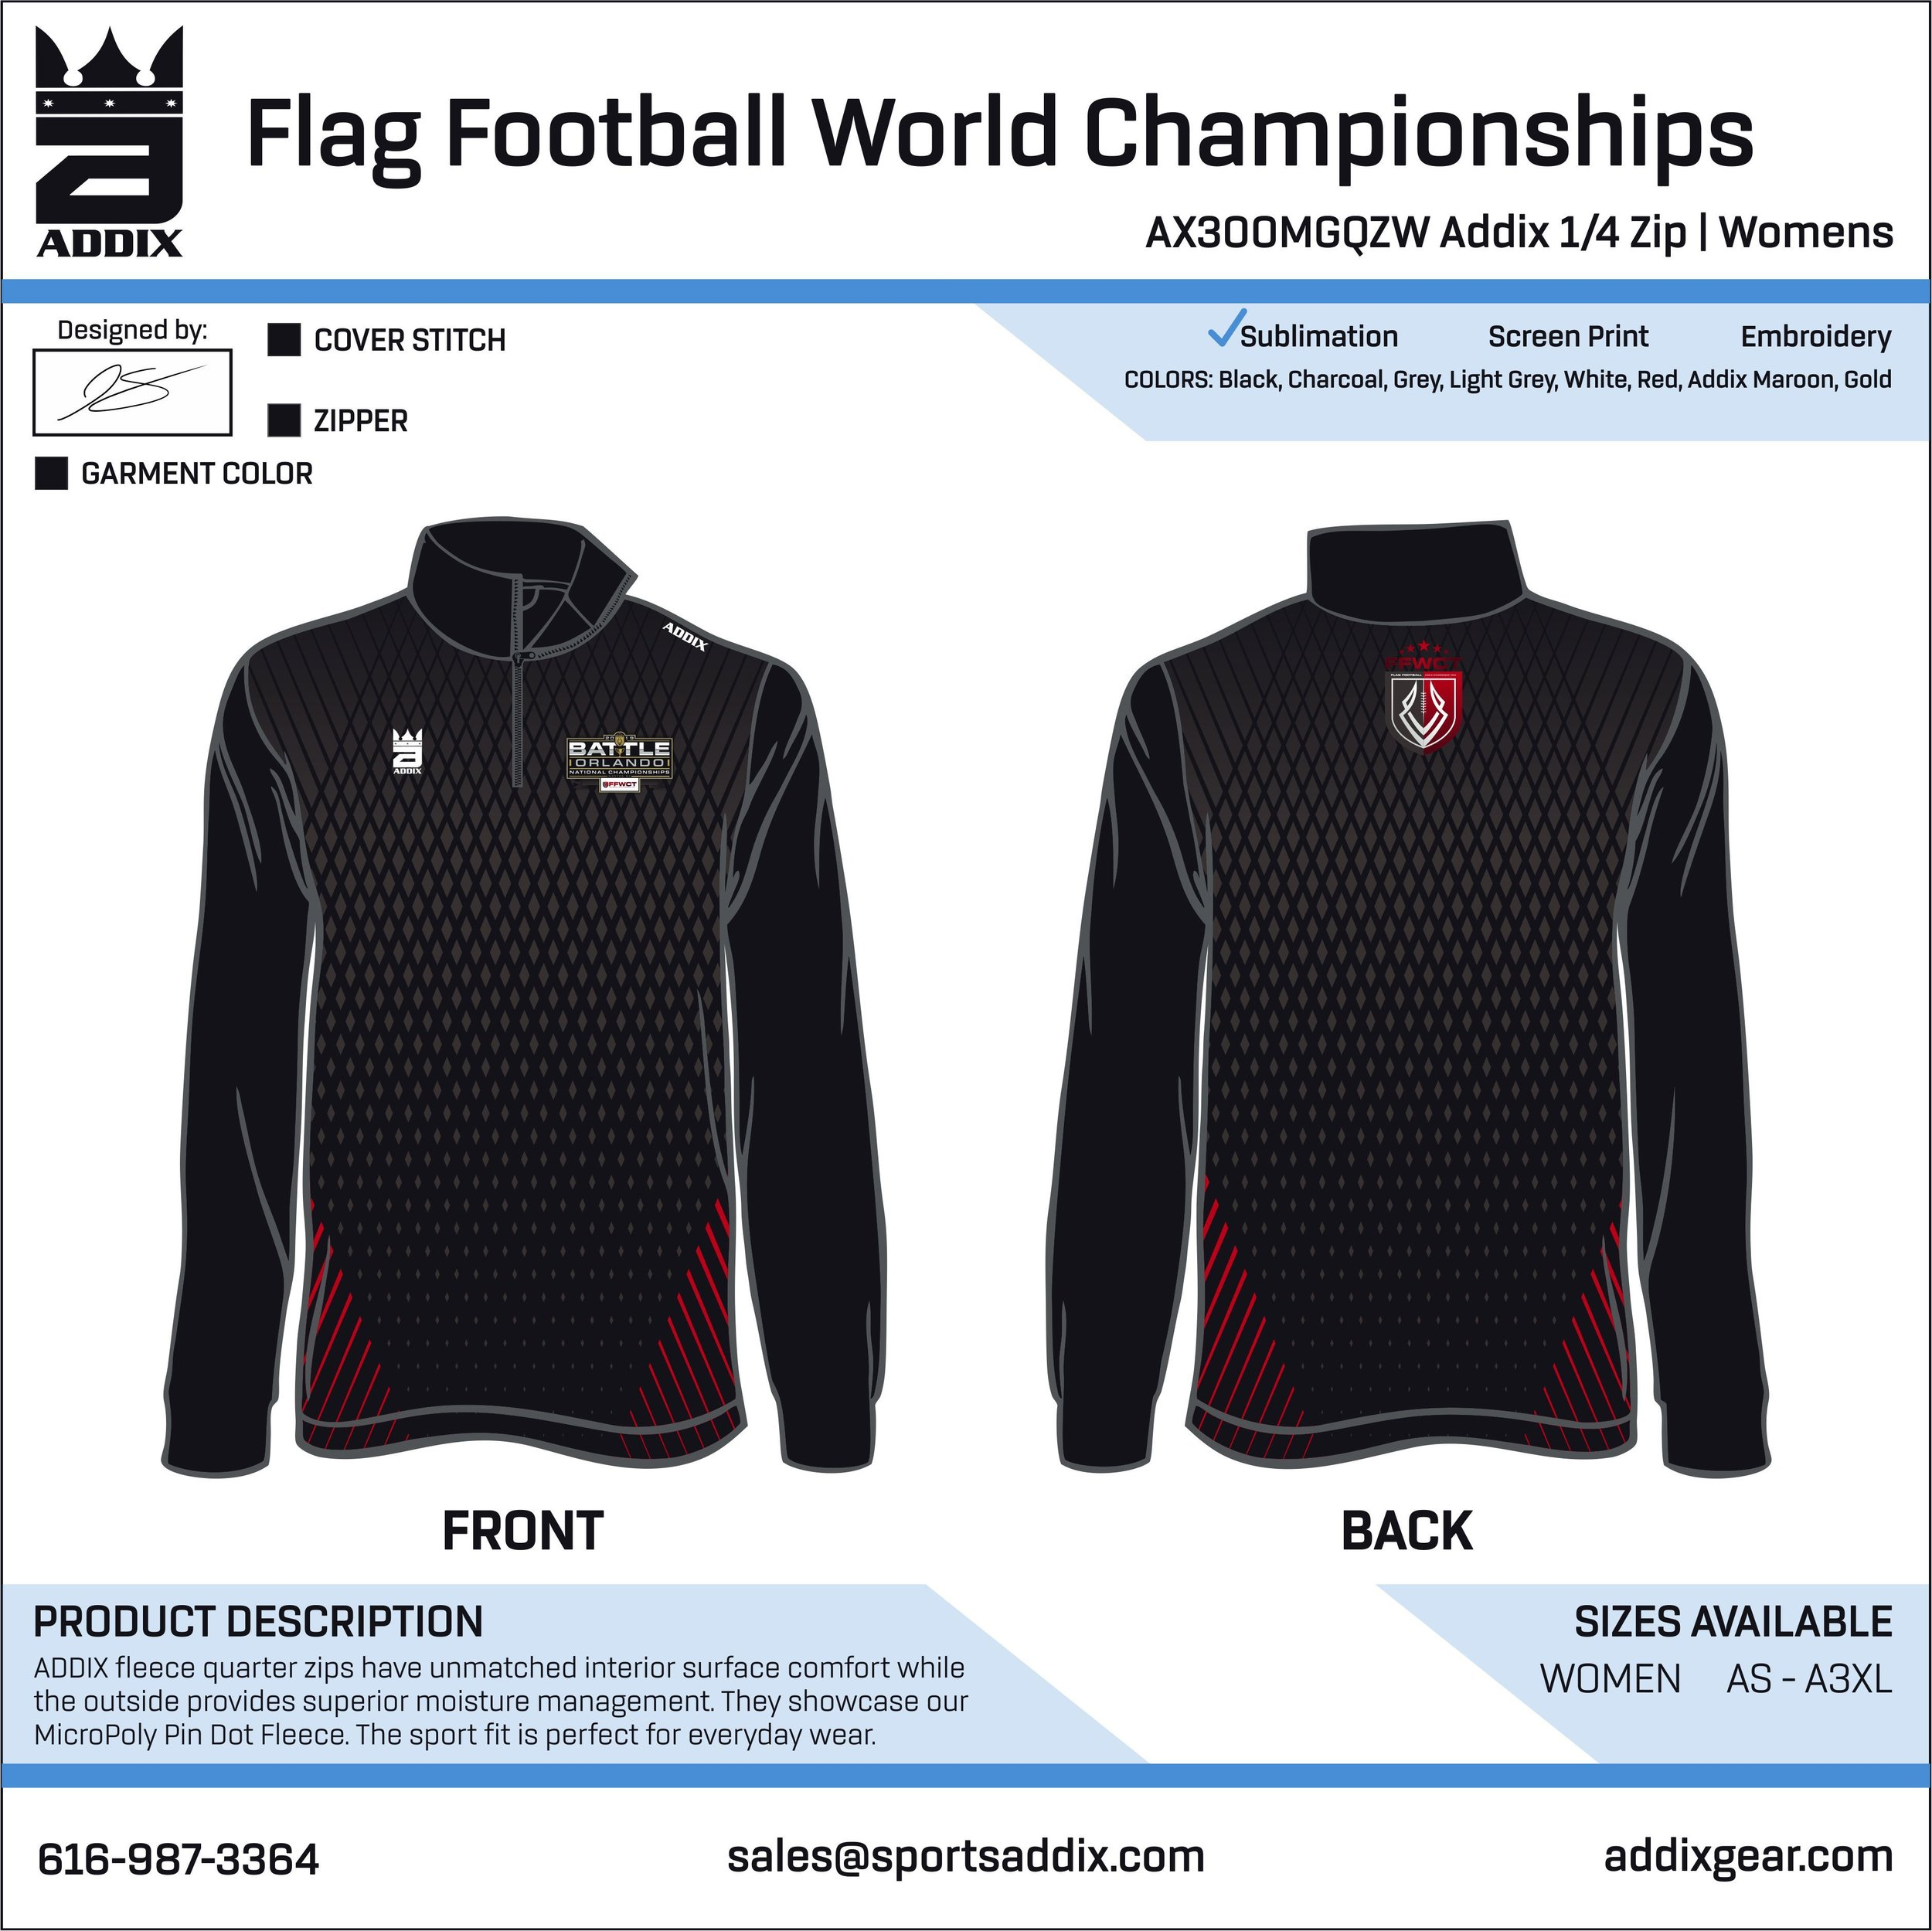 Flag Football World Championships_2018_12-26_JE_QZ Full Sub V2.jpg